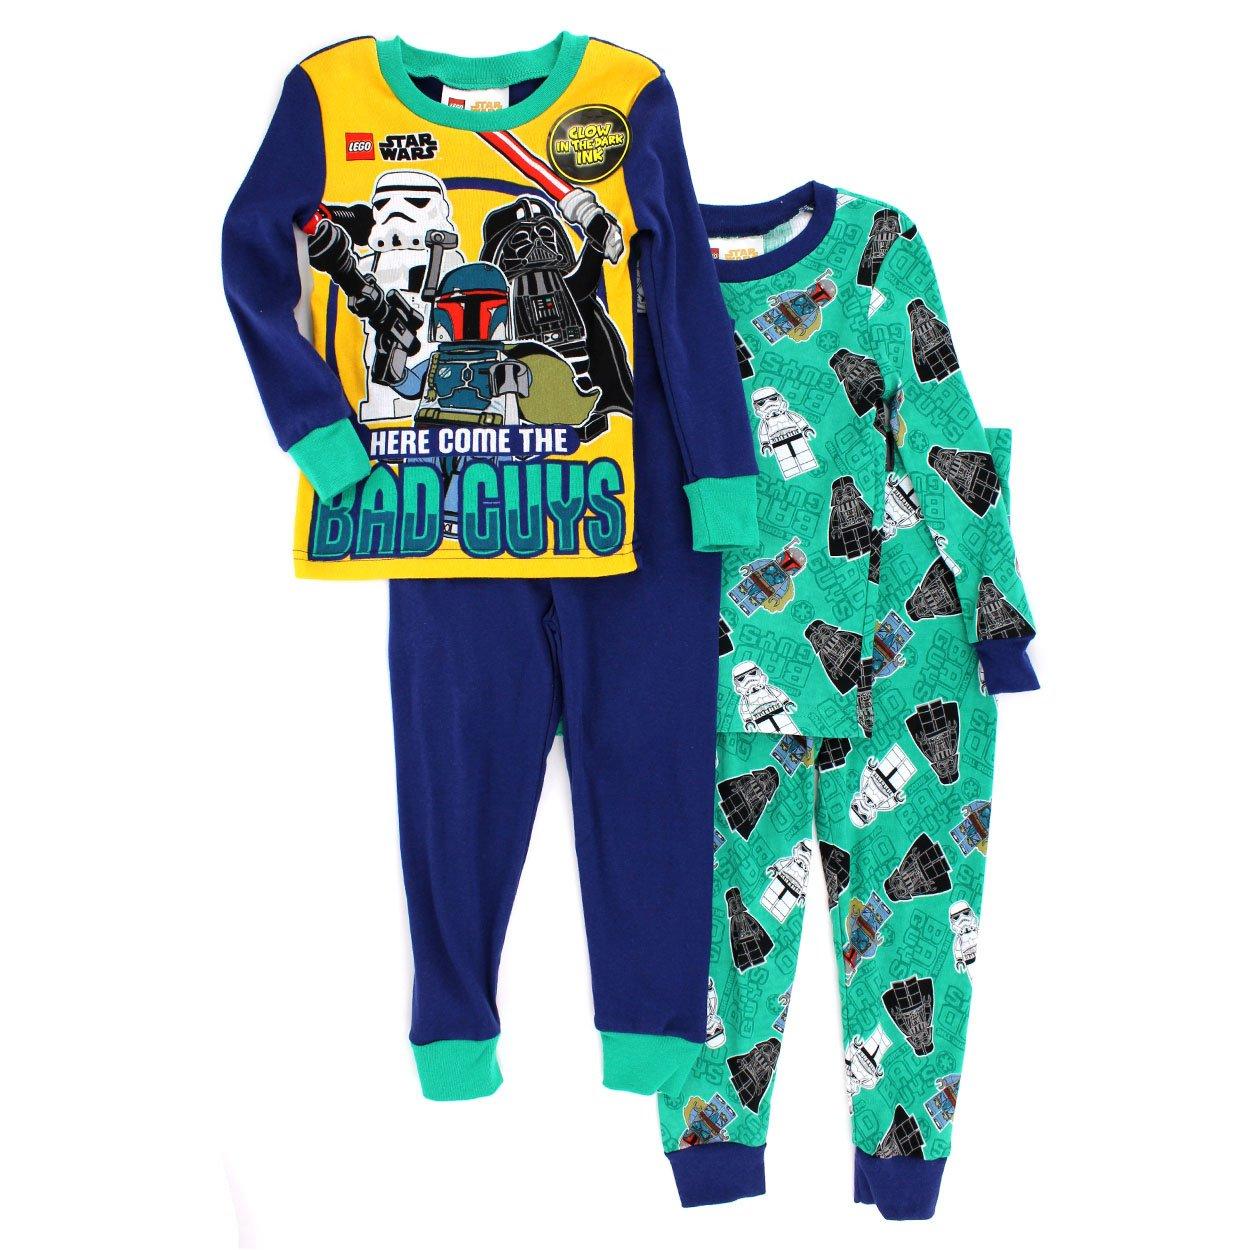 Amazon.com  Lego Star Wars Boys 2fer 4 pc Cotton Pajamas  Clothing 0c68ac40f